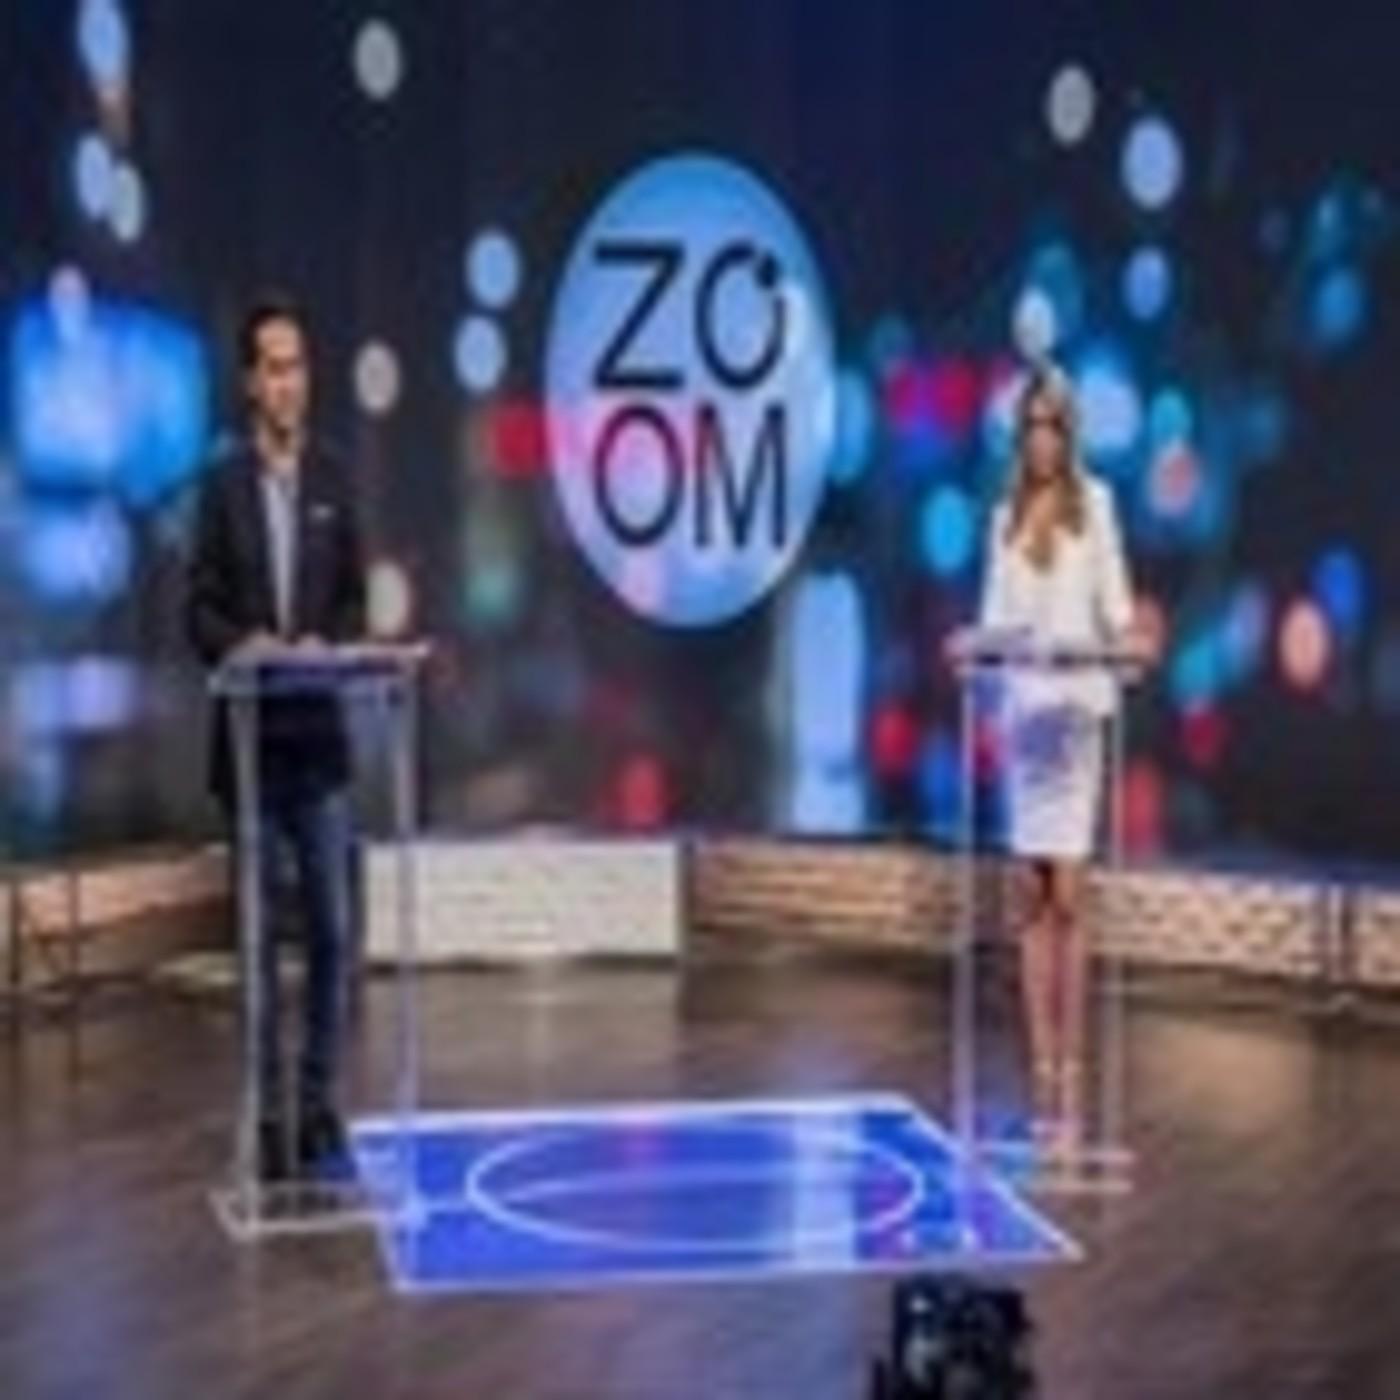 Cuarto milenio zoom 1x04 25 09 2016 desapariciones for Cuarto milenio zoom